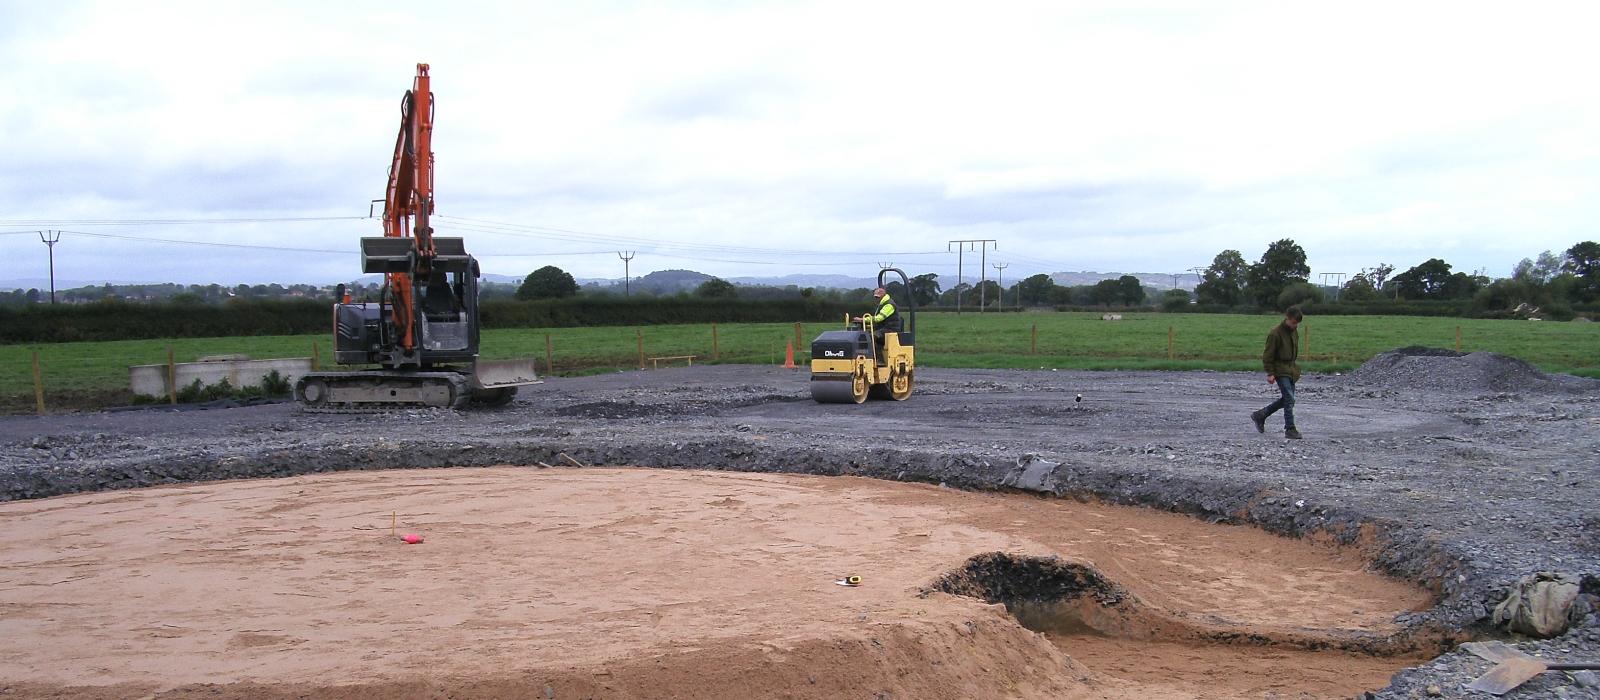 A Modern Excavator Flattening Land